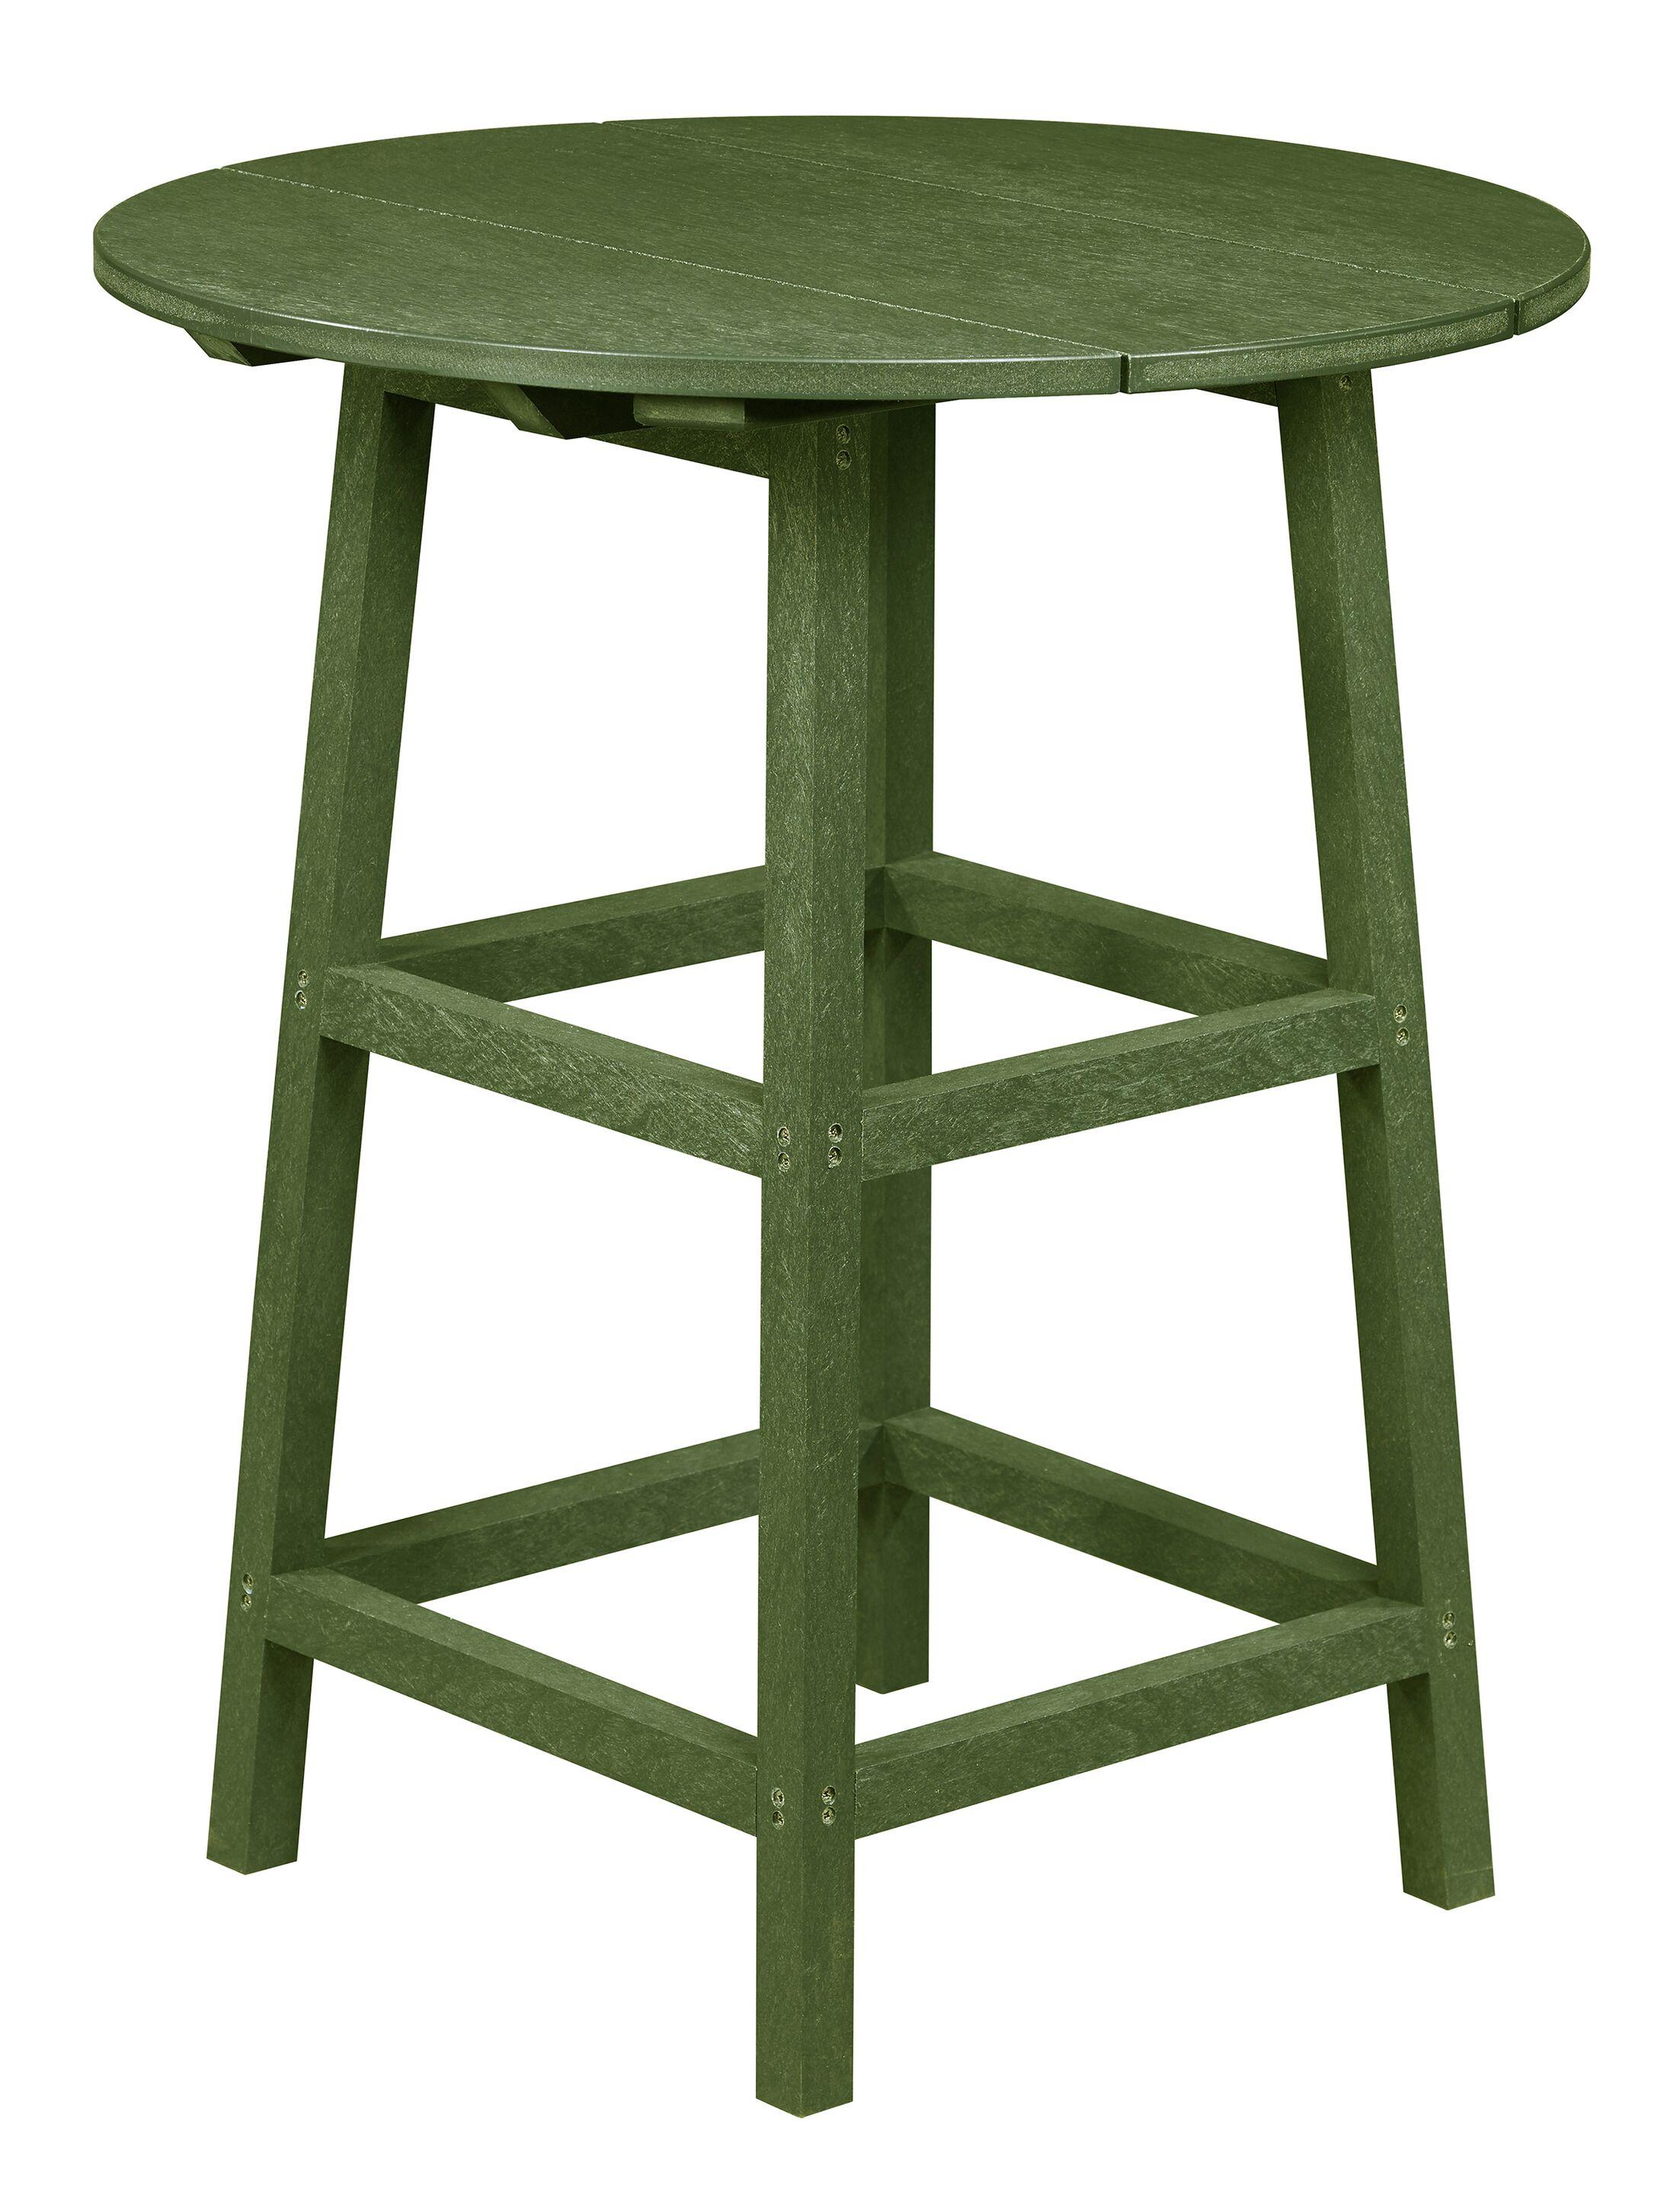 Kratochvil Plastic Bistro Table Color: Cactus Green, Table Size: 43